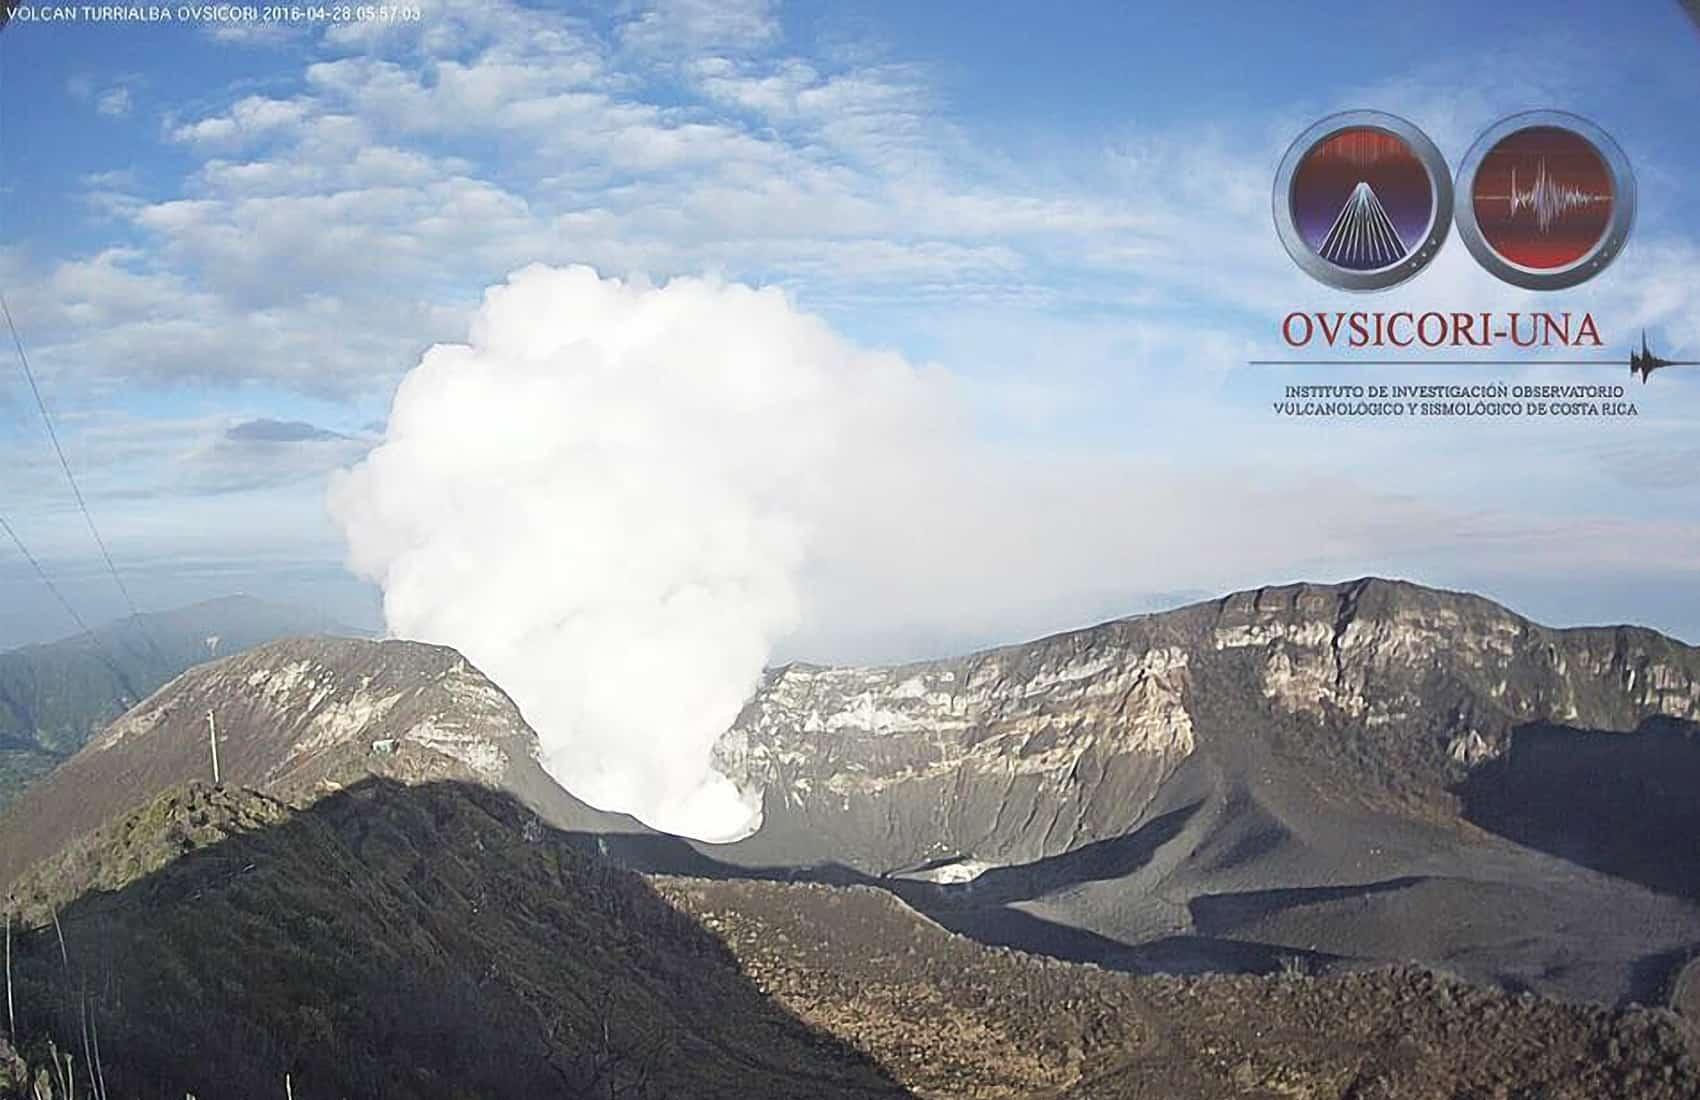 Turrialba Volcano, April 28, 2016